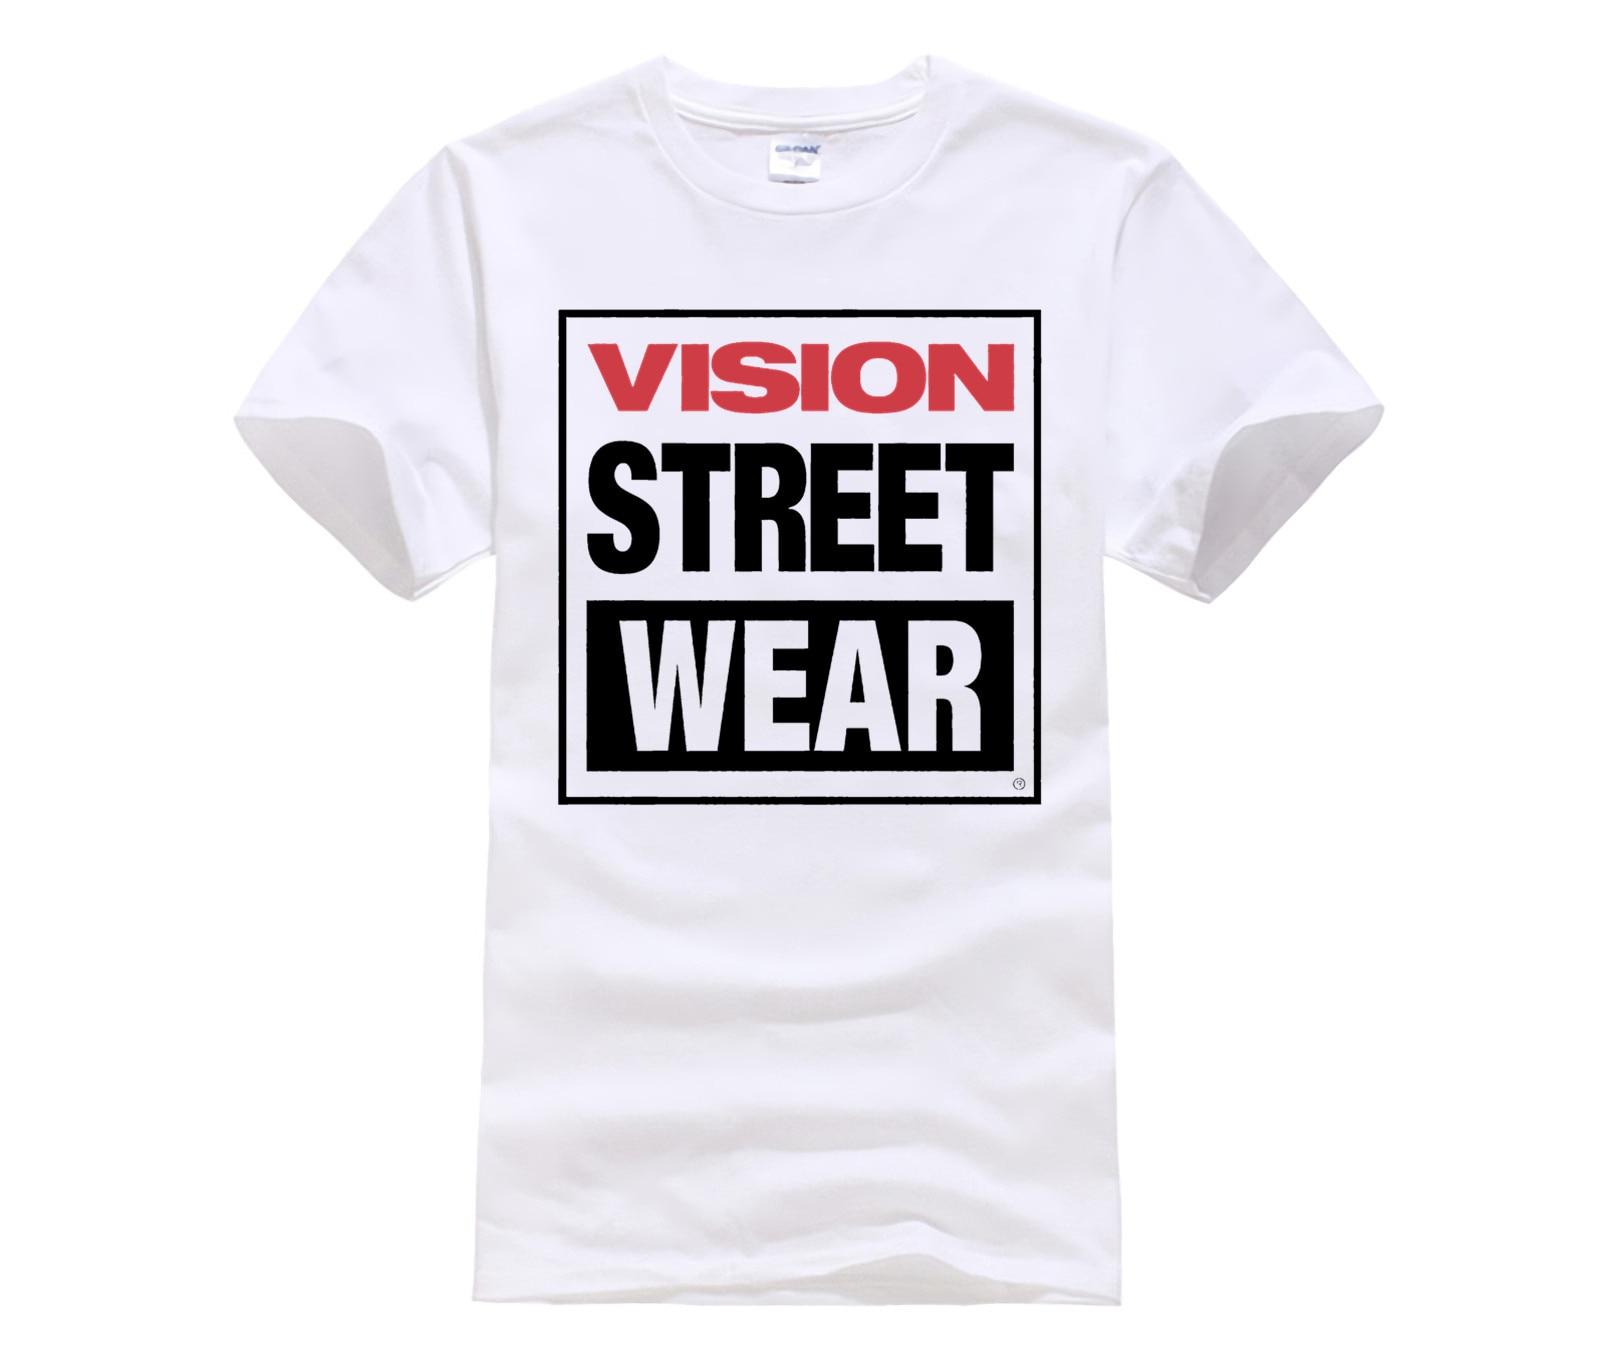 tshirt men Vintage Skate T Shirt Visione Tee Street Wear Shirt retro round neck cool  man's T-shirt